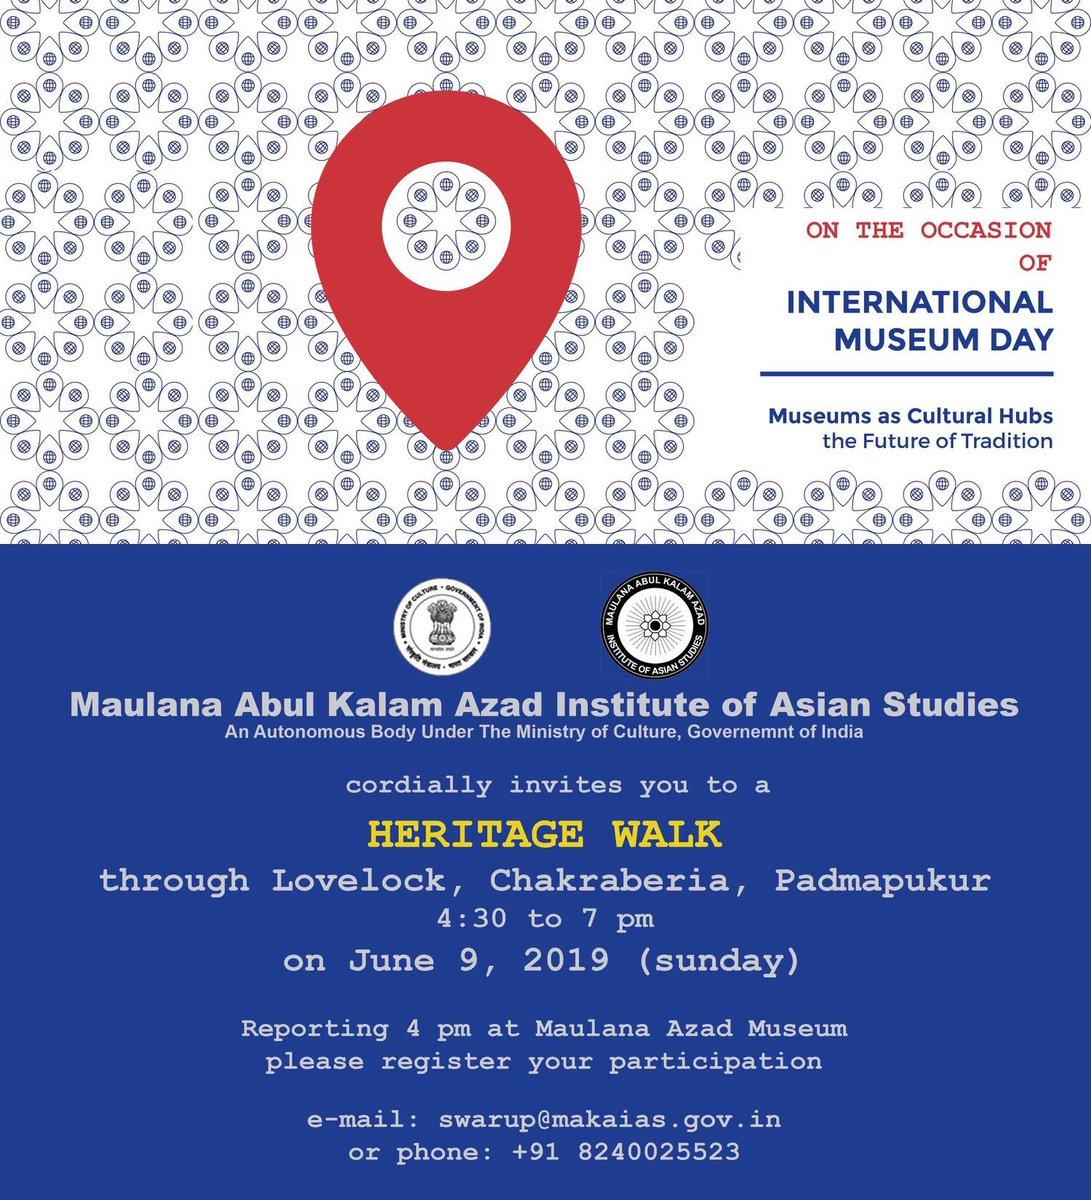 Excited to support this initiative by #MaulanaAzad #Museum!  Please register at the link below: https://forms.gle/VaSk6HmPQfxLRyQh8…  Meeting Point: Maulana Azad Museum (https://goo.gl/maps/qKo6JiRSSitm7GqD8…)  #internationalmuseumday #explorecalcutta #experiencekolkata #calcutta #heritagewalk #localhistory